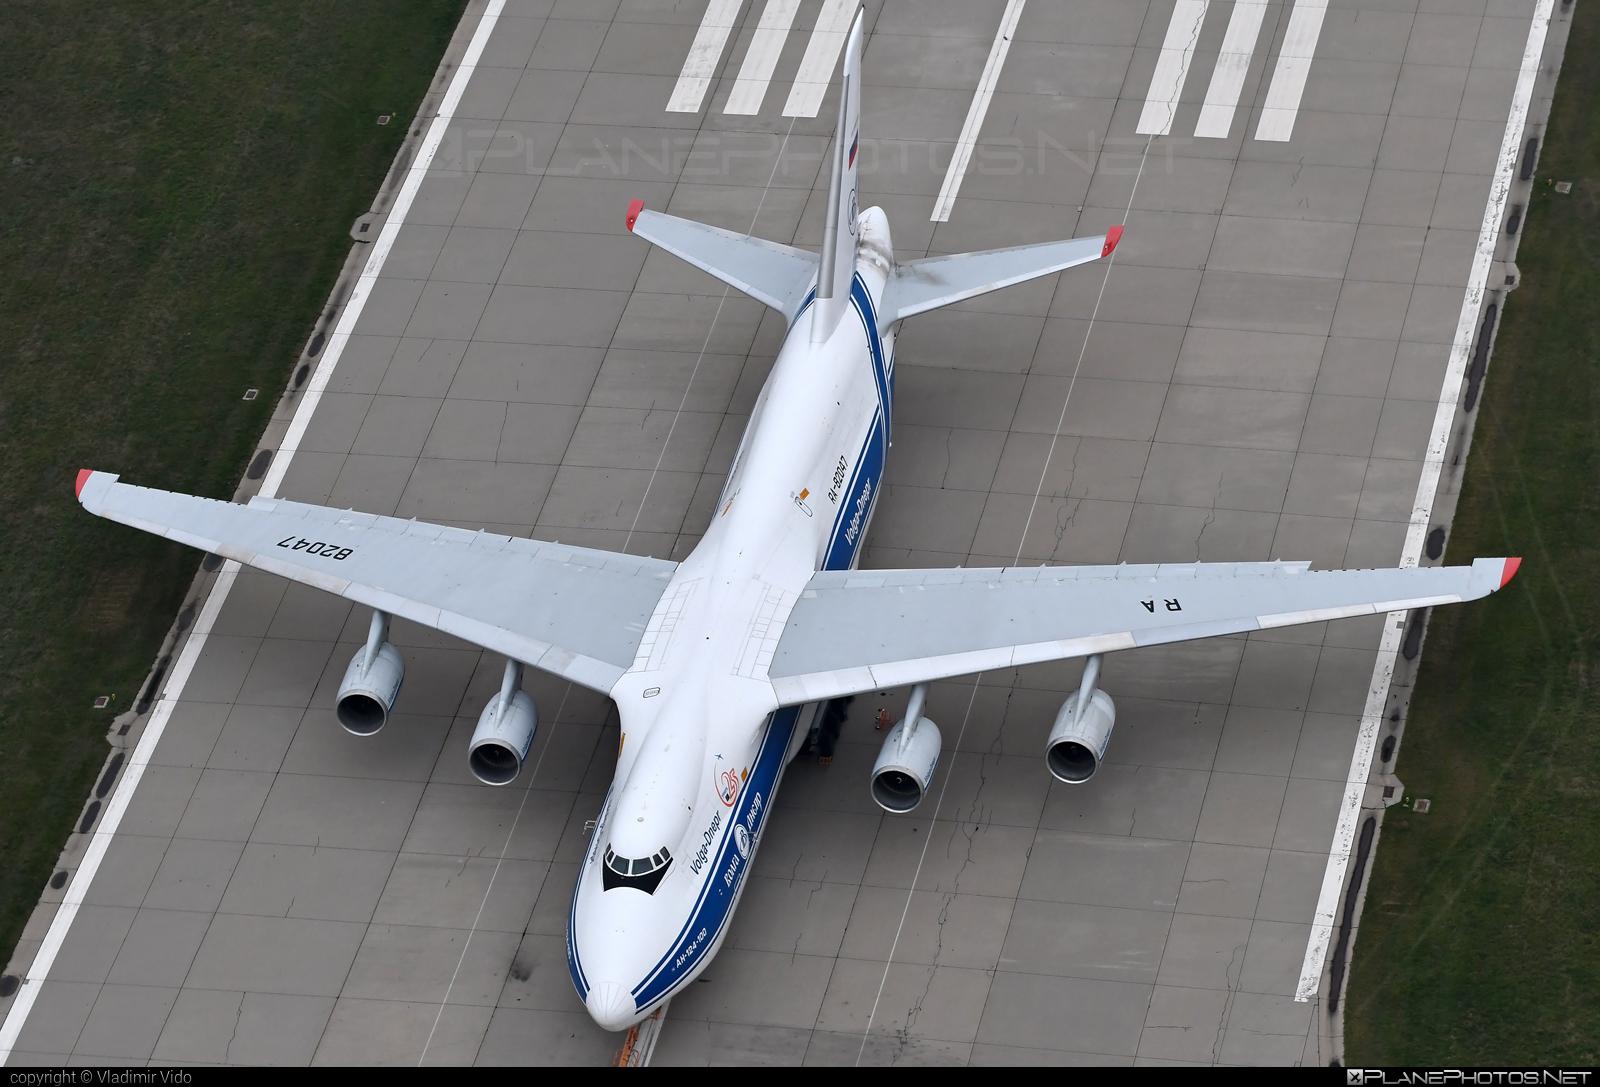 Antonov An-124-100 Ruslan - RA-82047 operated by Volga Dnepr Airlines #an124 #an124100 #antonov #antonov124 #ruslan